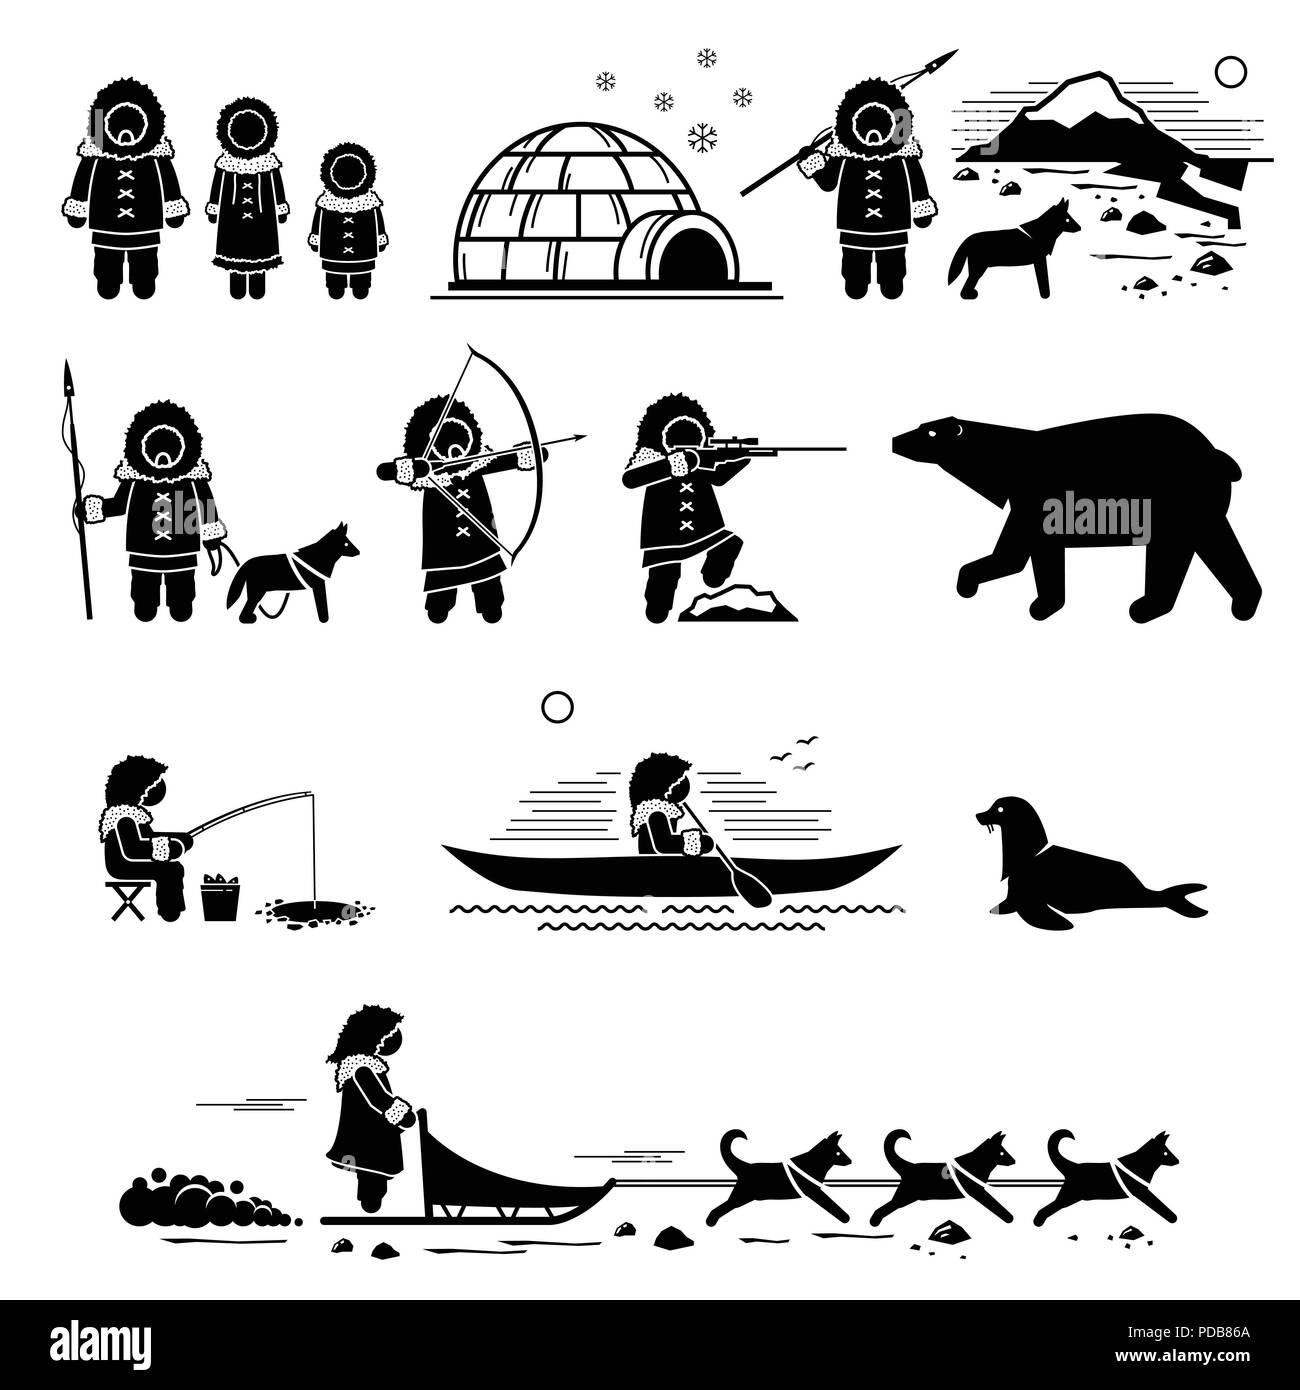 hight resolution of eskimo people lifestyle and animals stick figure pictogram depicts eskimo human igloo